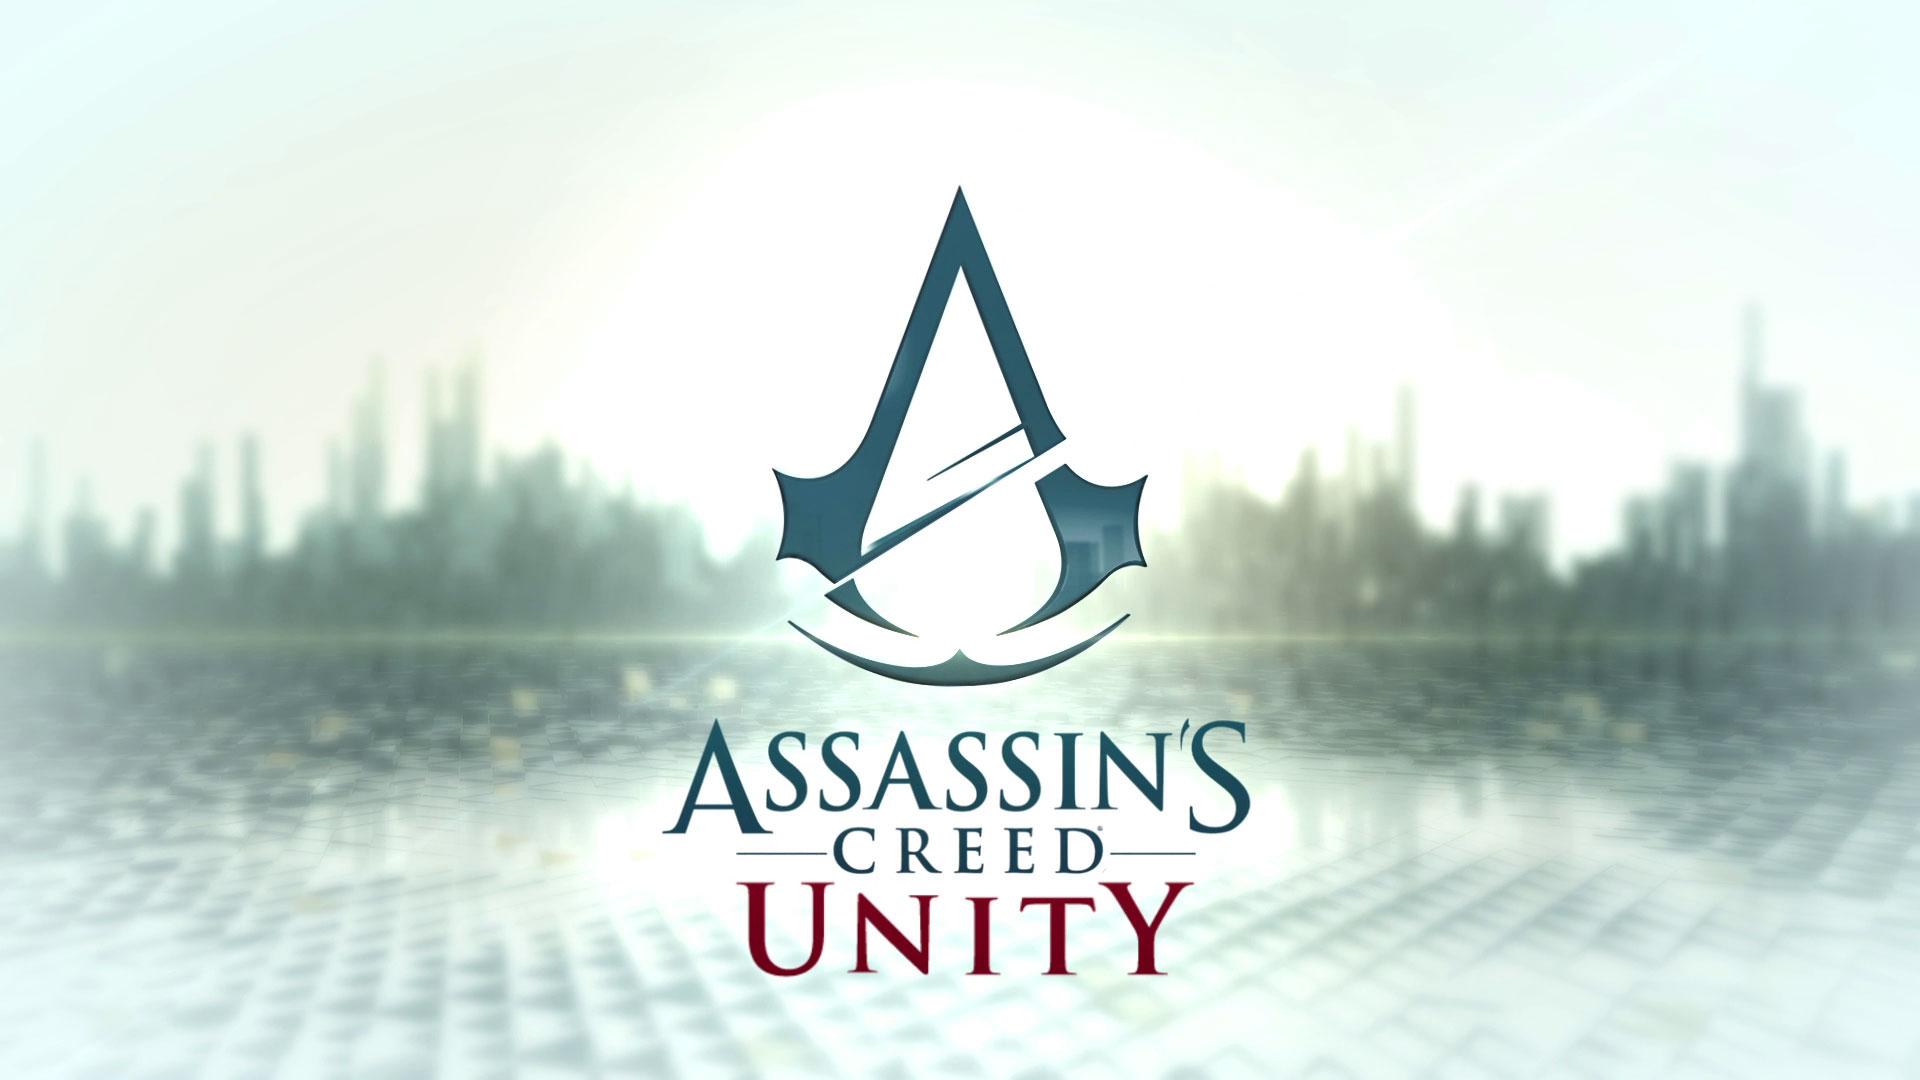 Black Ops Ii Wallpaper Assassin S Creed Unity Tv Spot Gamersprey